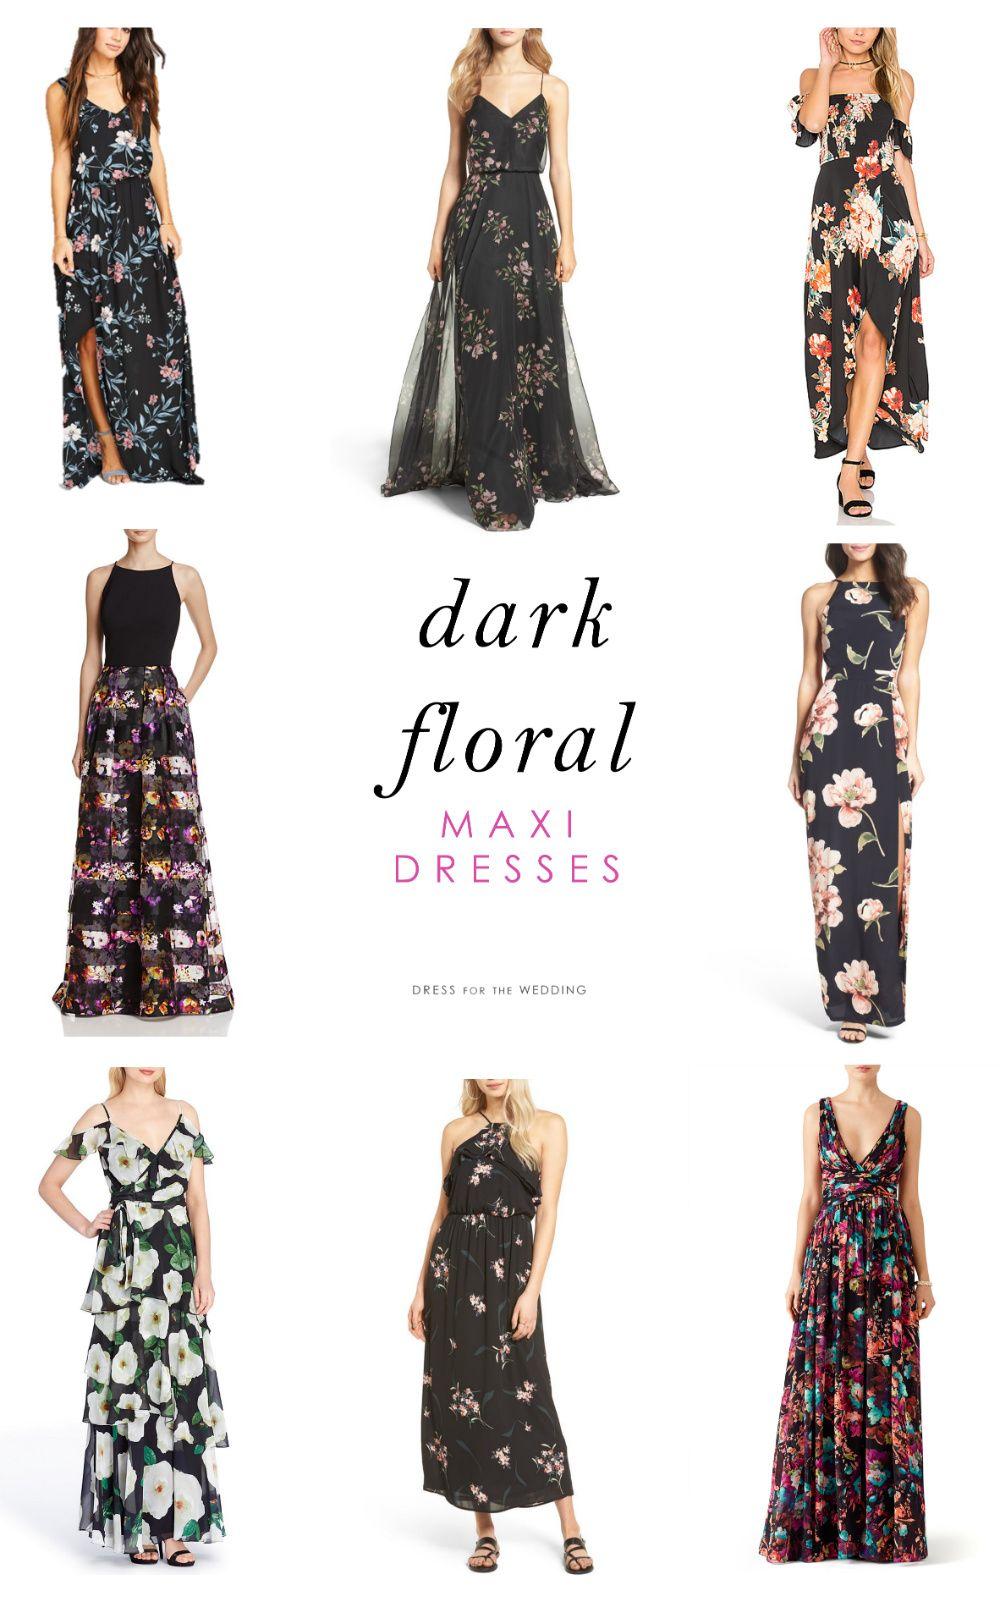 Dark Floral Maxi Dresses Dress For The Wedding Black Floral Maxi Dress Floral Maxi Dress Dark Floral Dress [ 1624 x 1000 Pixel ]